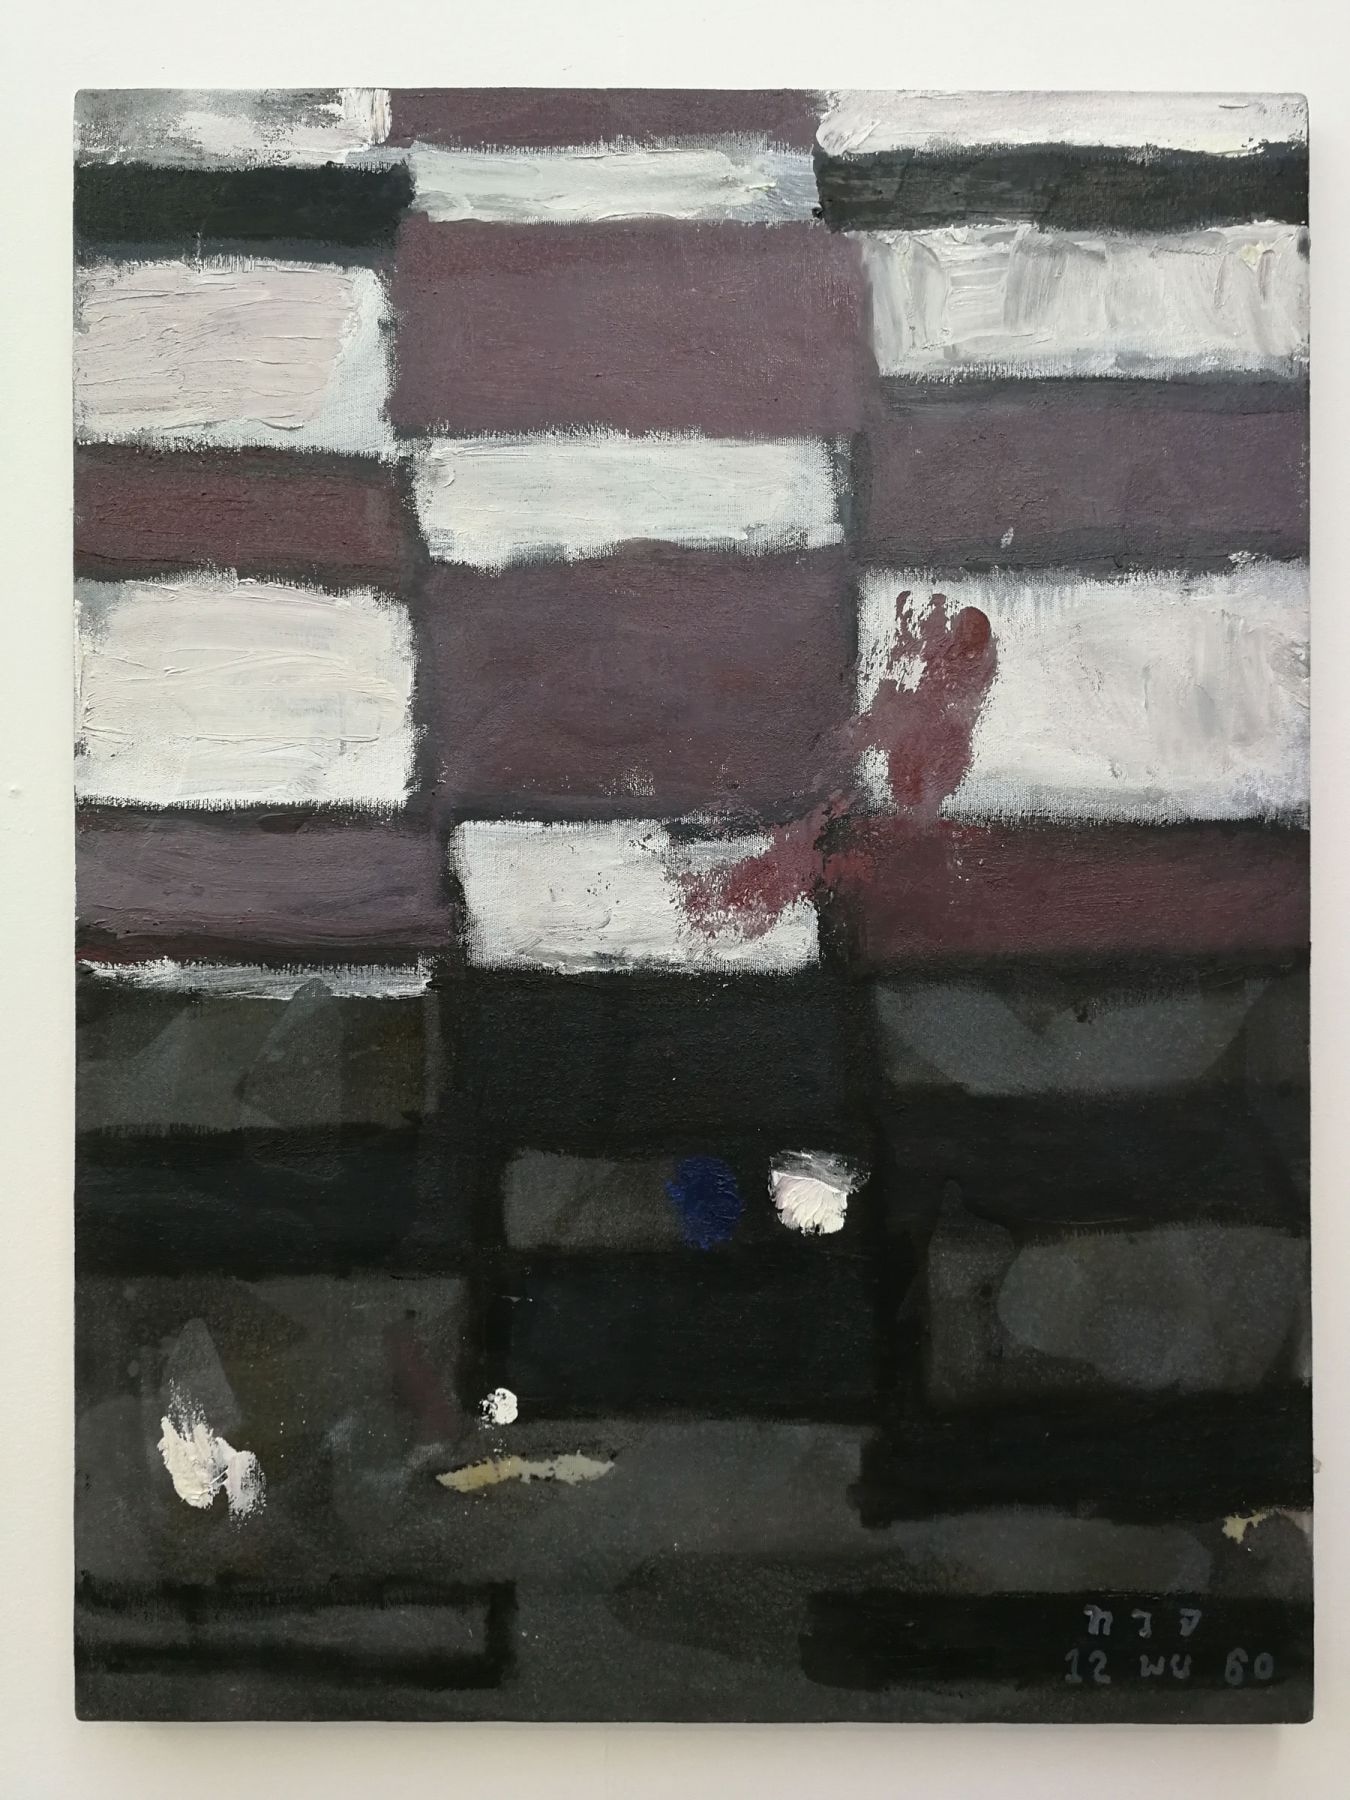 Thaiwijit Puengkasemsomboon Untitled (grid), 2017 28.7 x 21.3 in (73 x 54 cm)